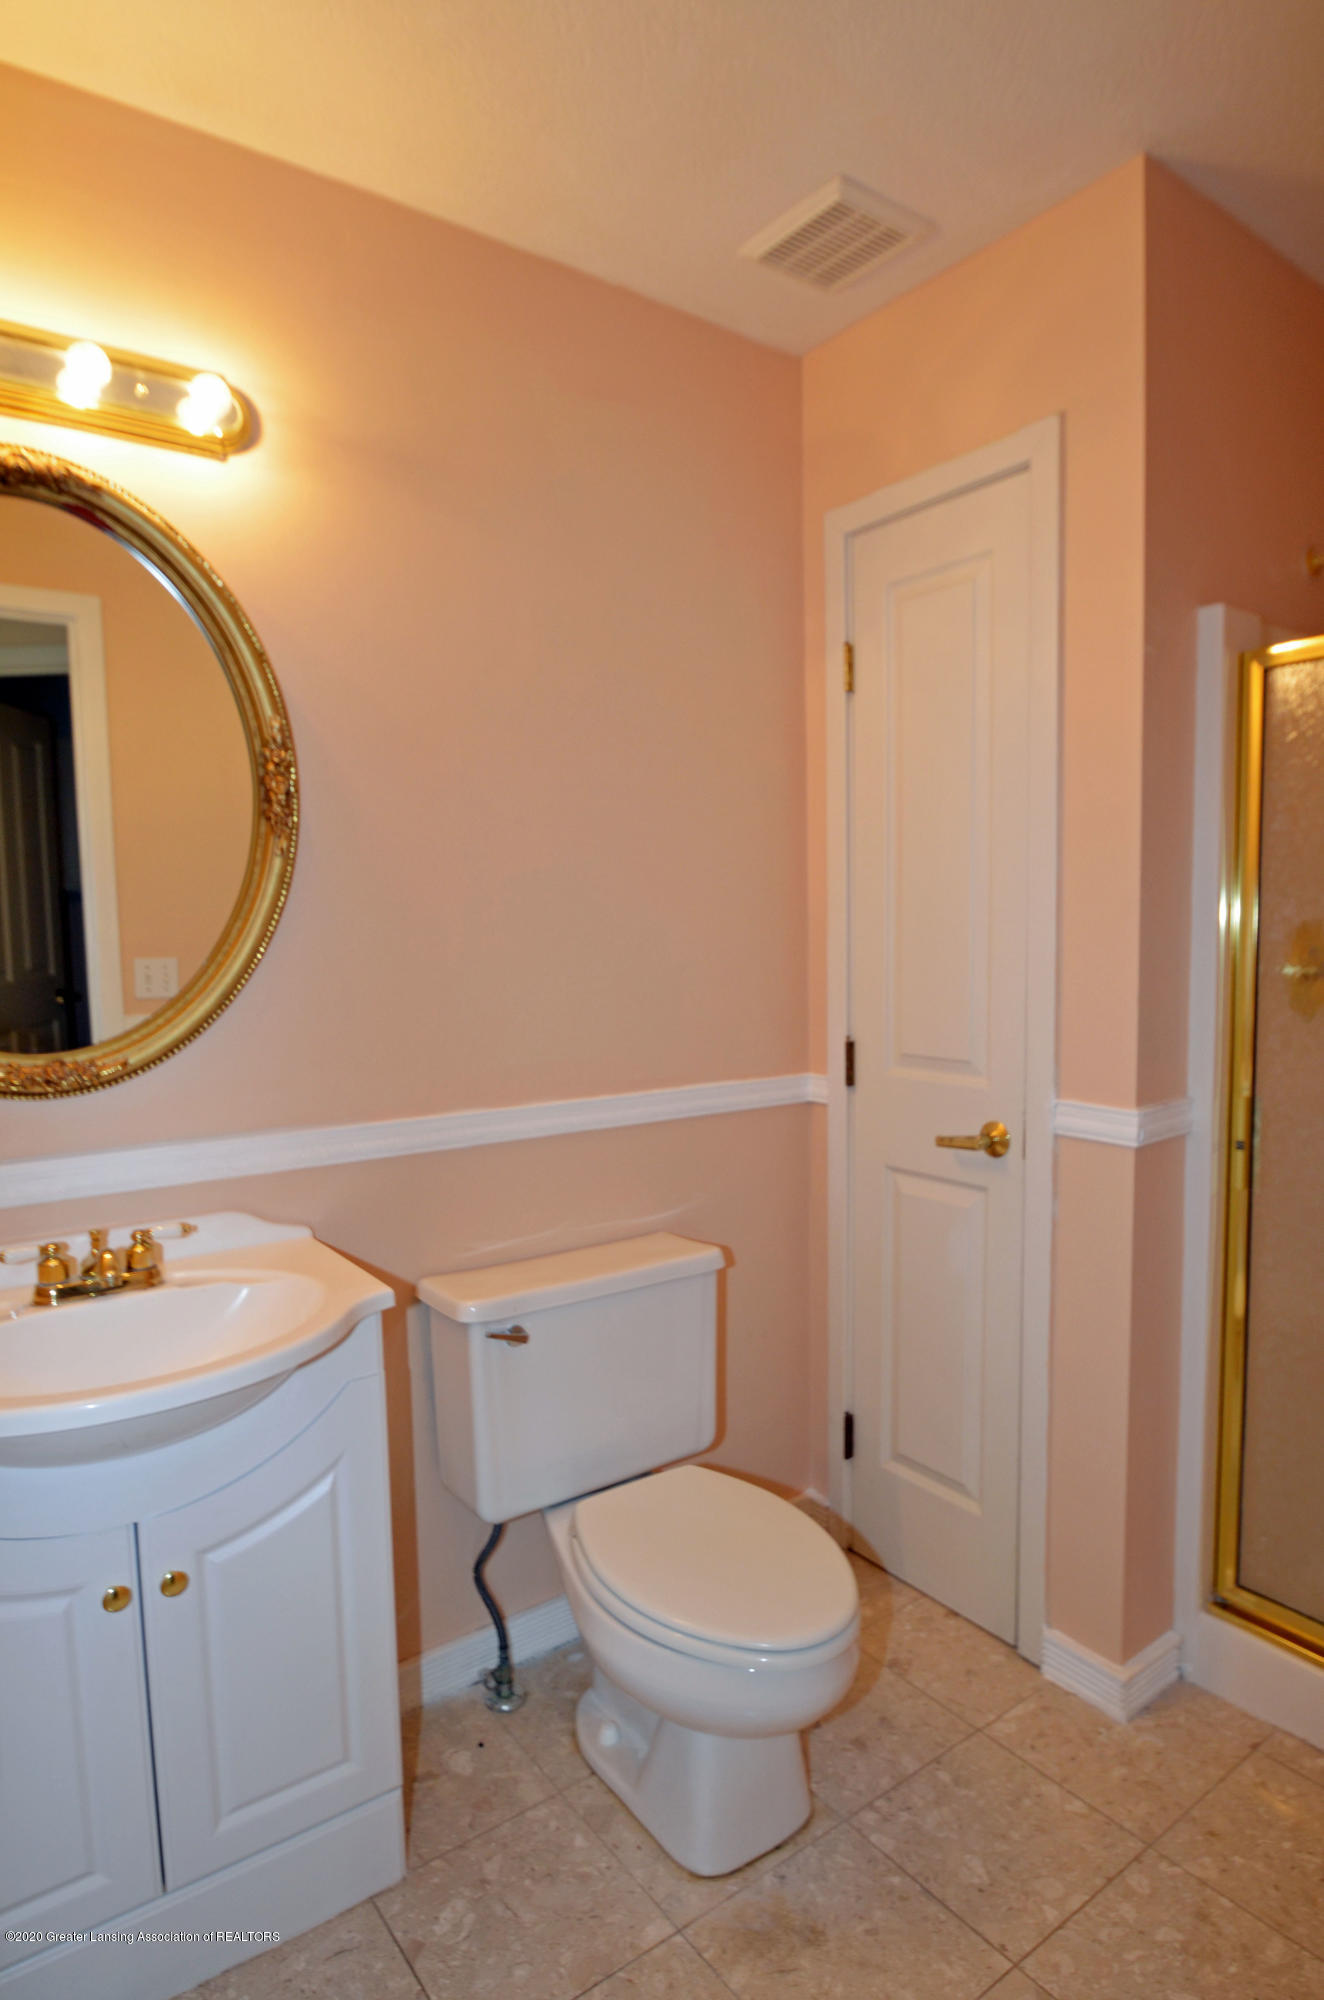 3536 Fairhills Dr - First floor full bath - 21